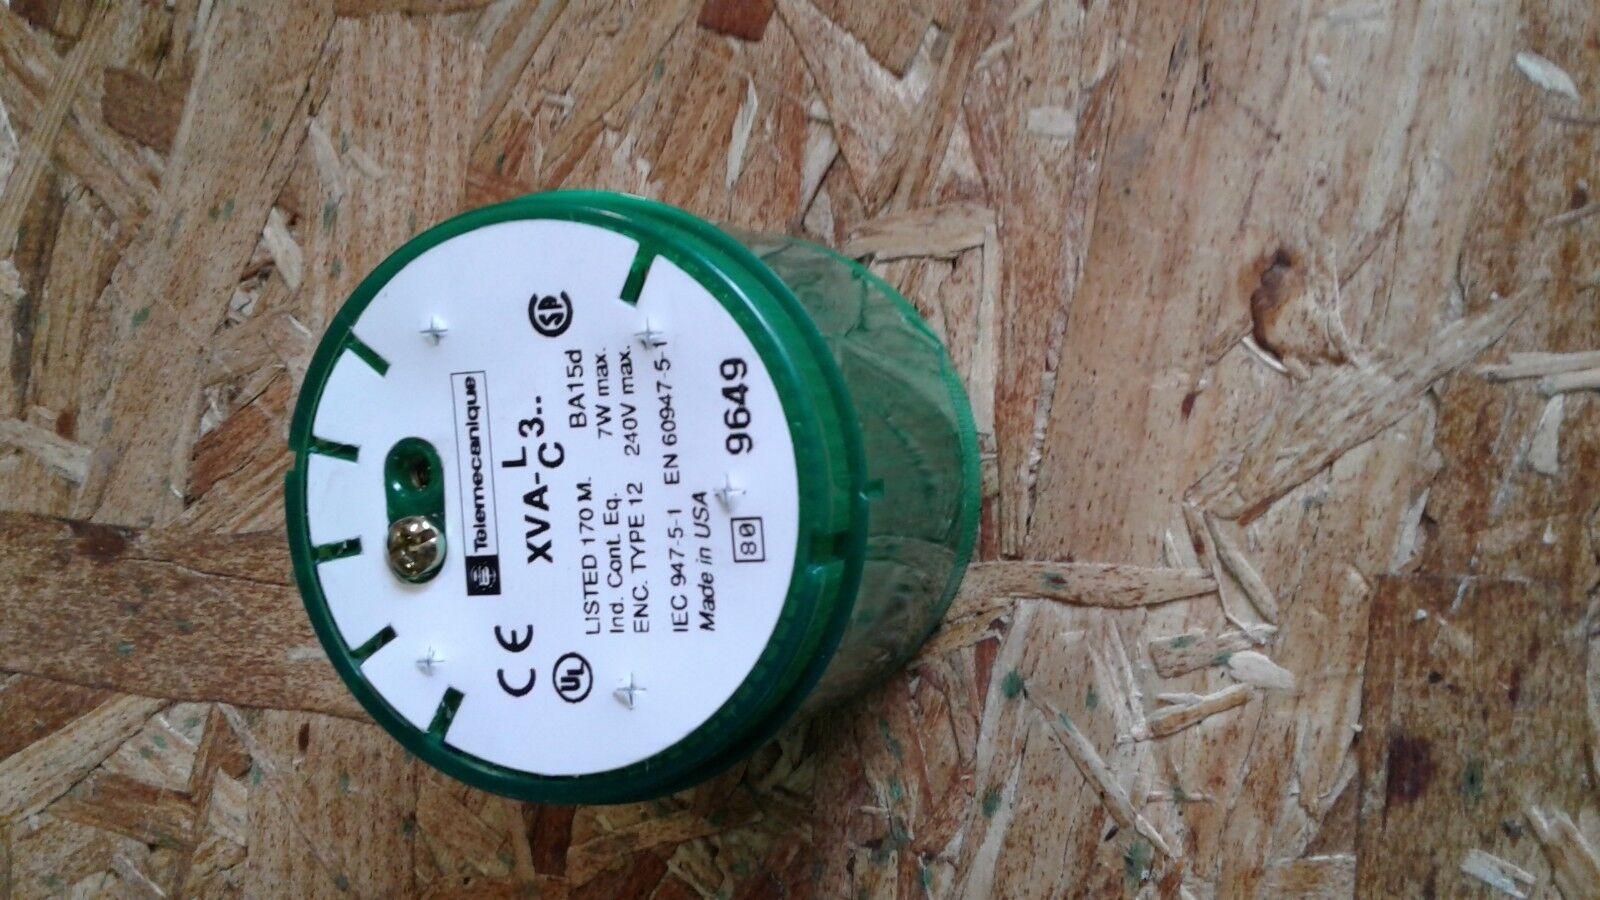 TELEMECANIQUE XVAC331 GREEN LIGHTSTACK BEACON LENS 28046 NEW CONDITION IN BOX